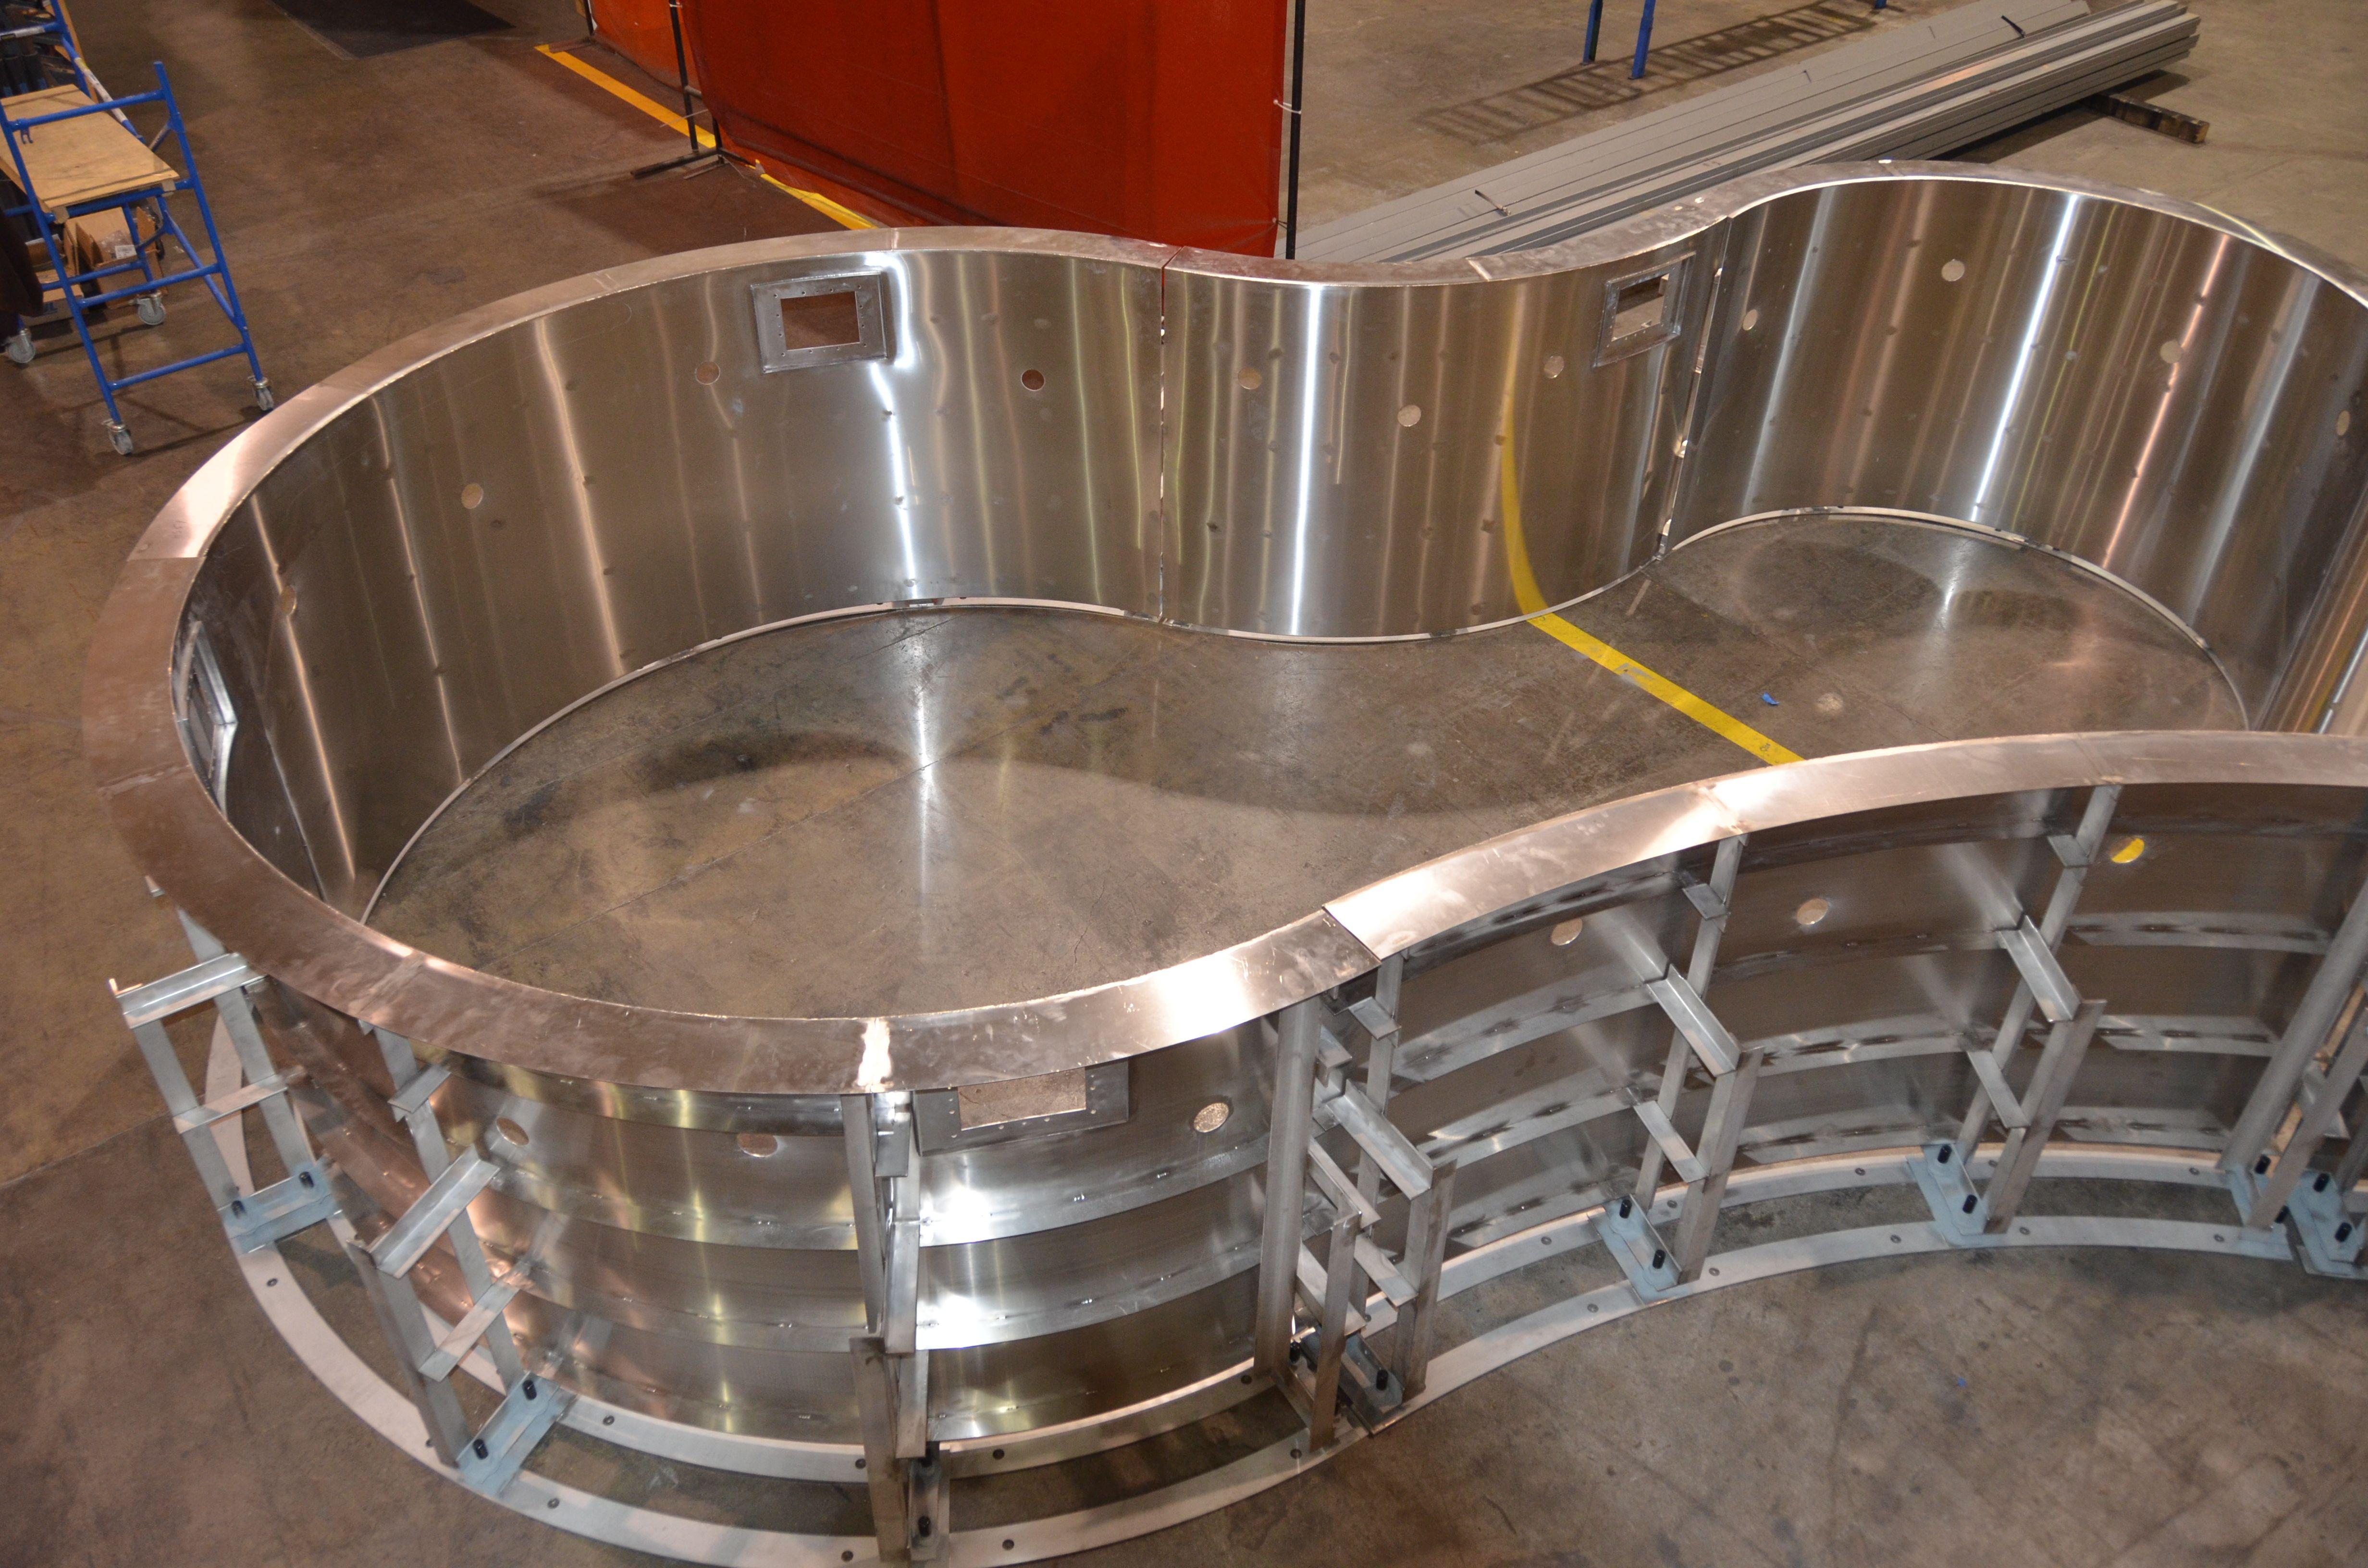 Piscine En Inox Steel And Style ever wonder what a stainless steel spa looks like before it